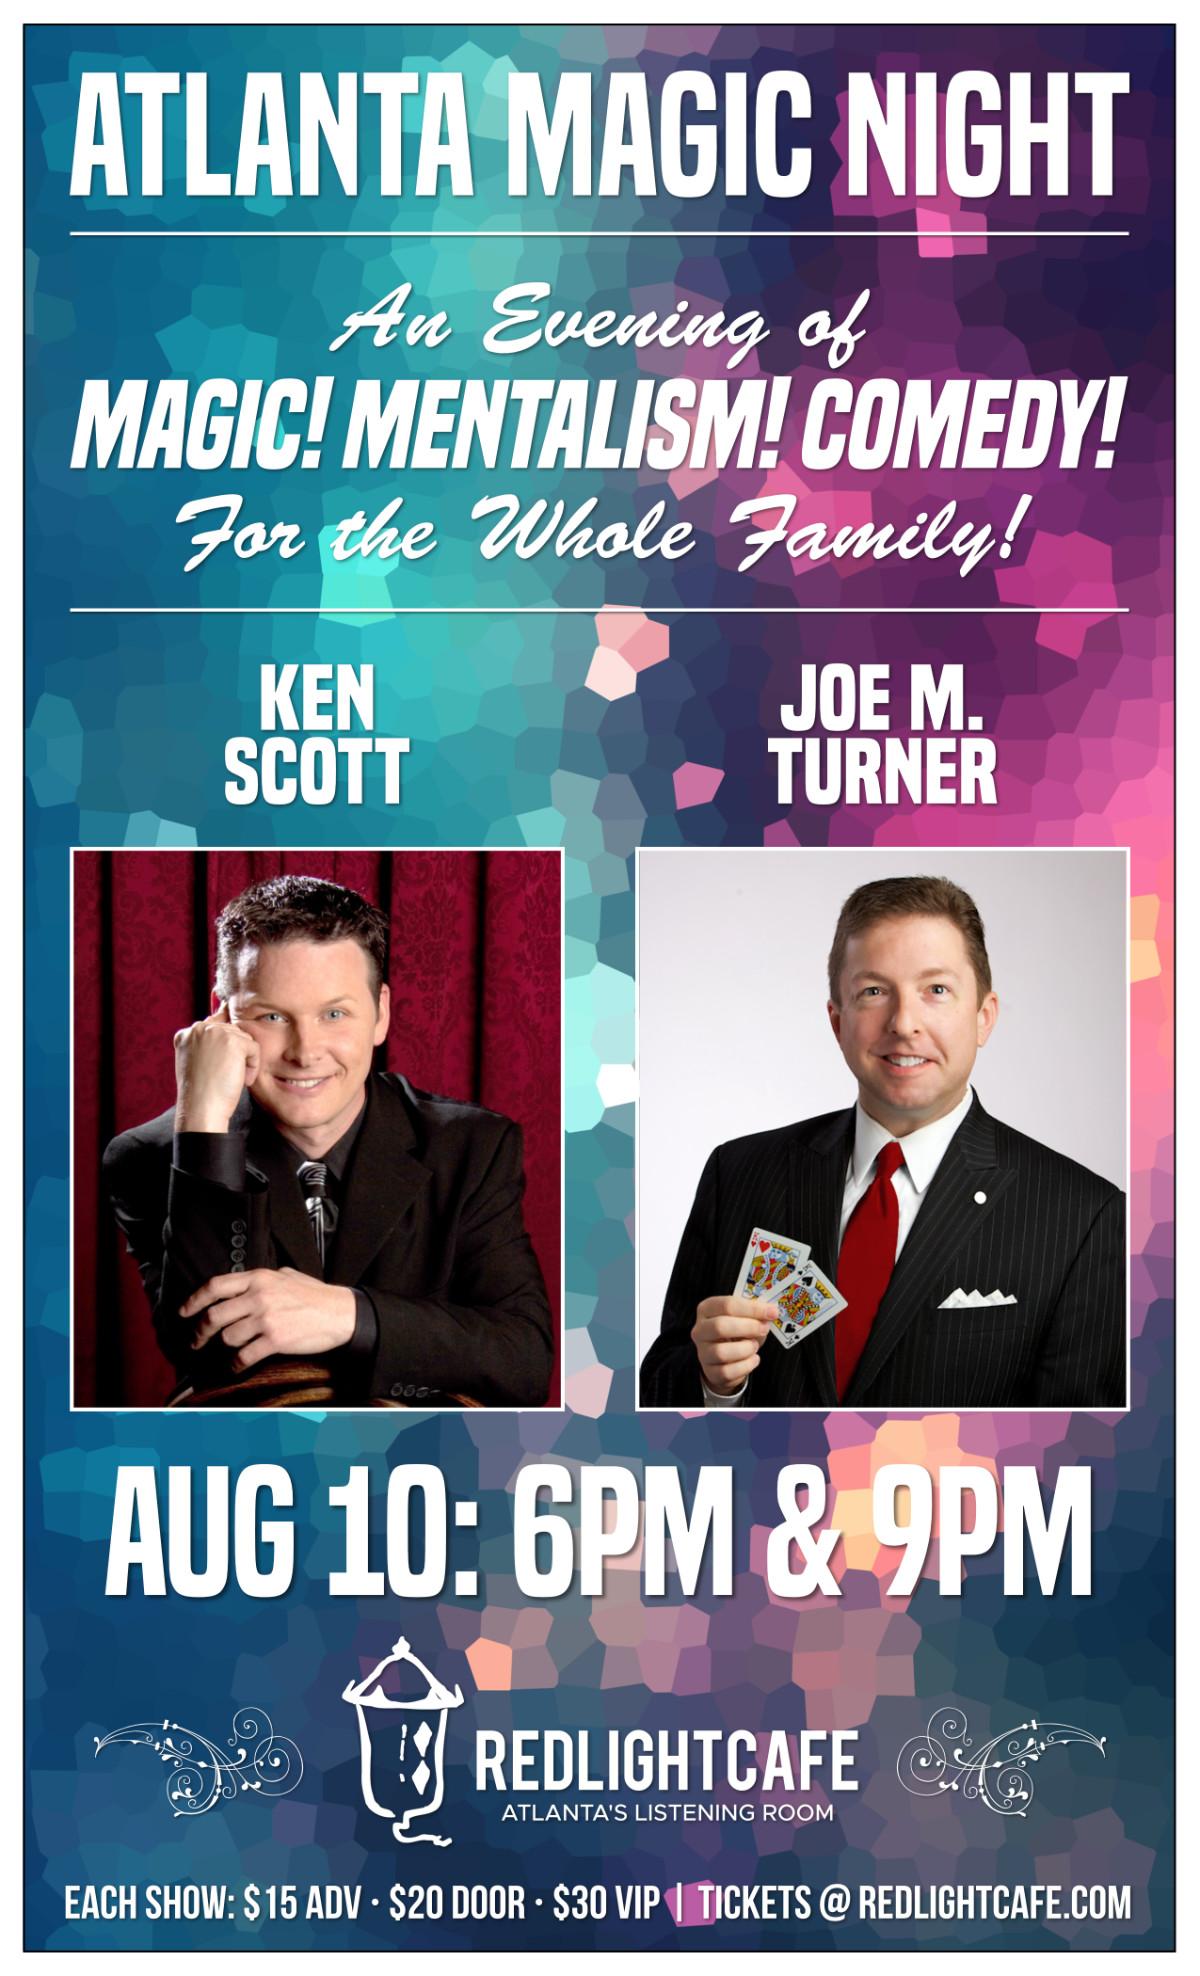 Atlanta Magic Night! w/ Ken Scott + Joe M. Turner - 6 PM SHOW — August 10, 2019 — Red Light Café, Atlanta, GA